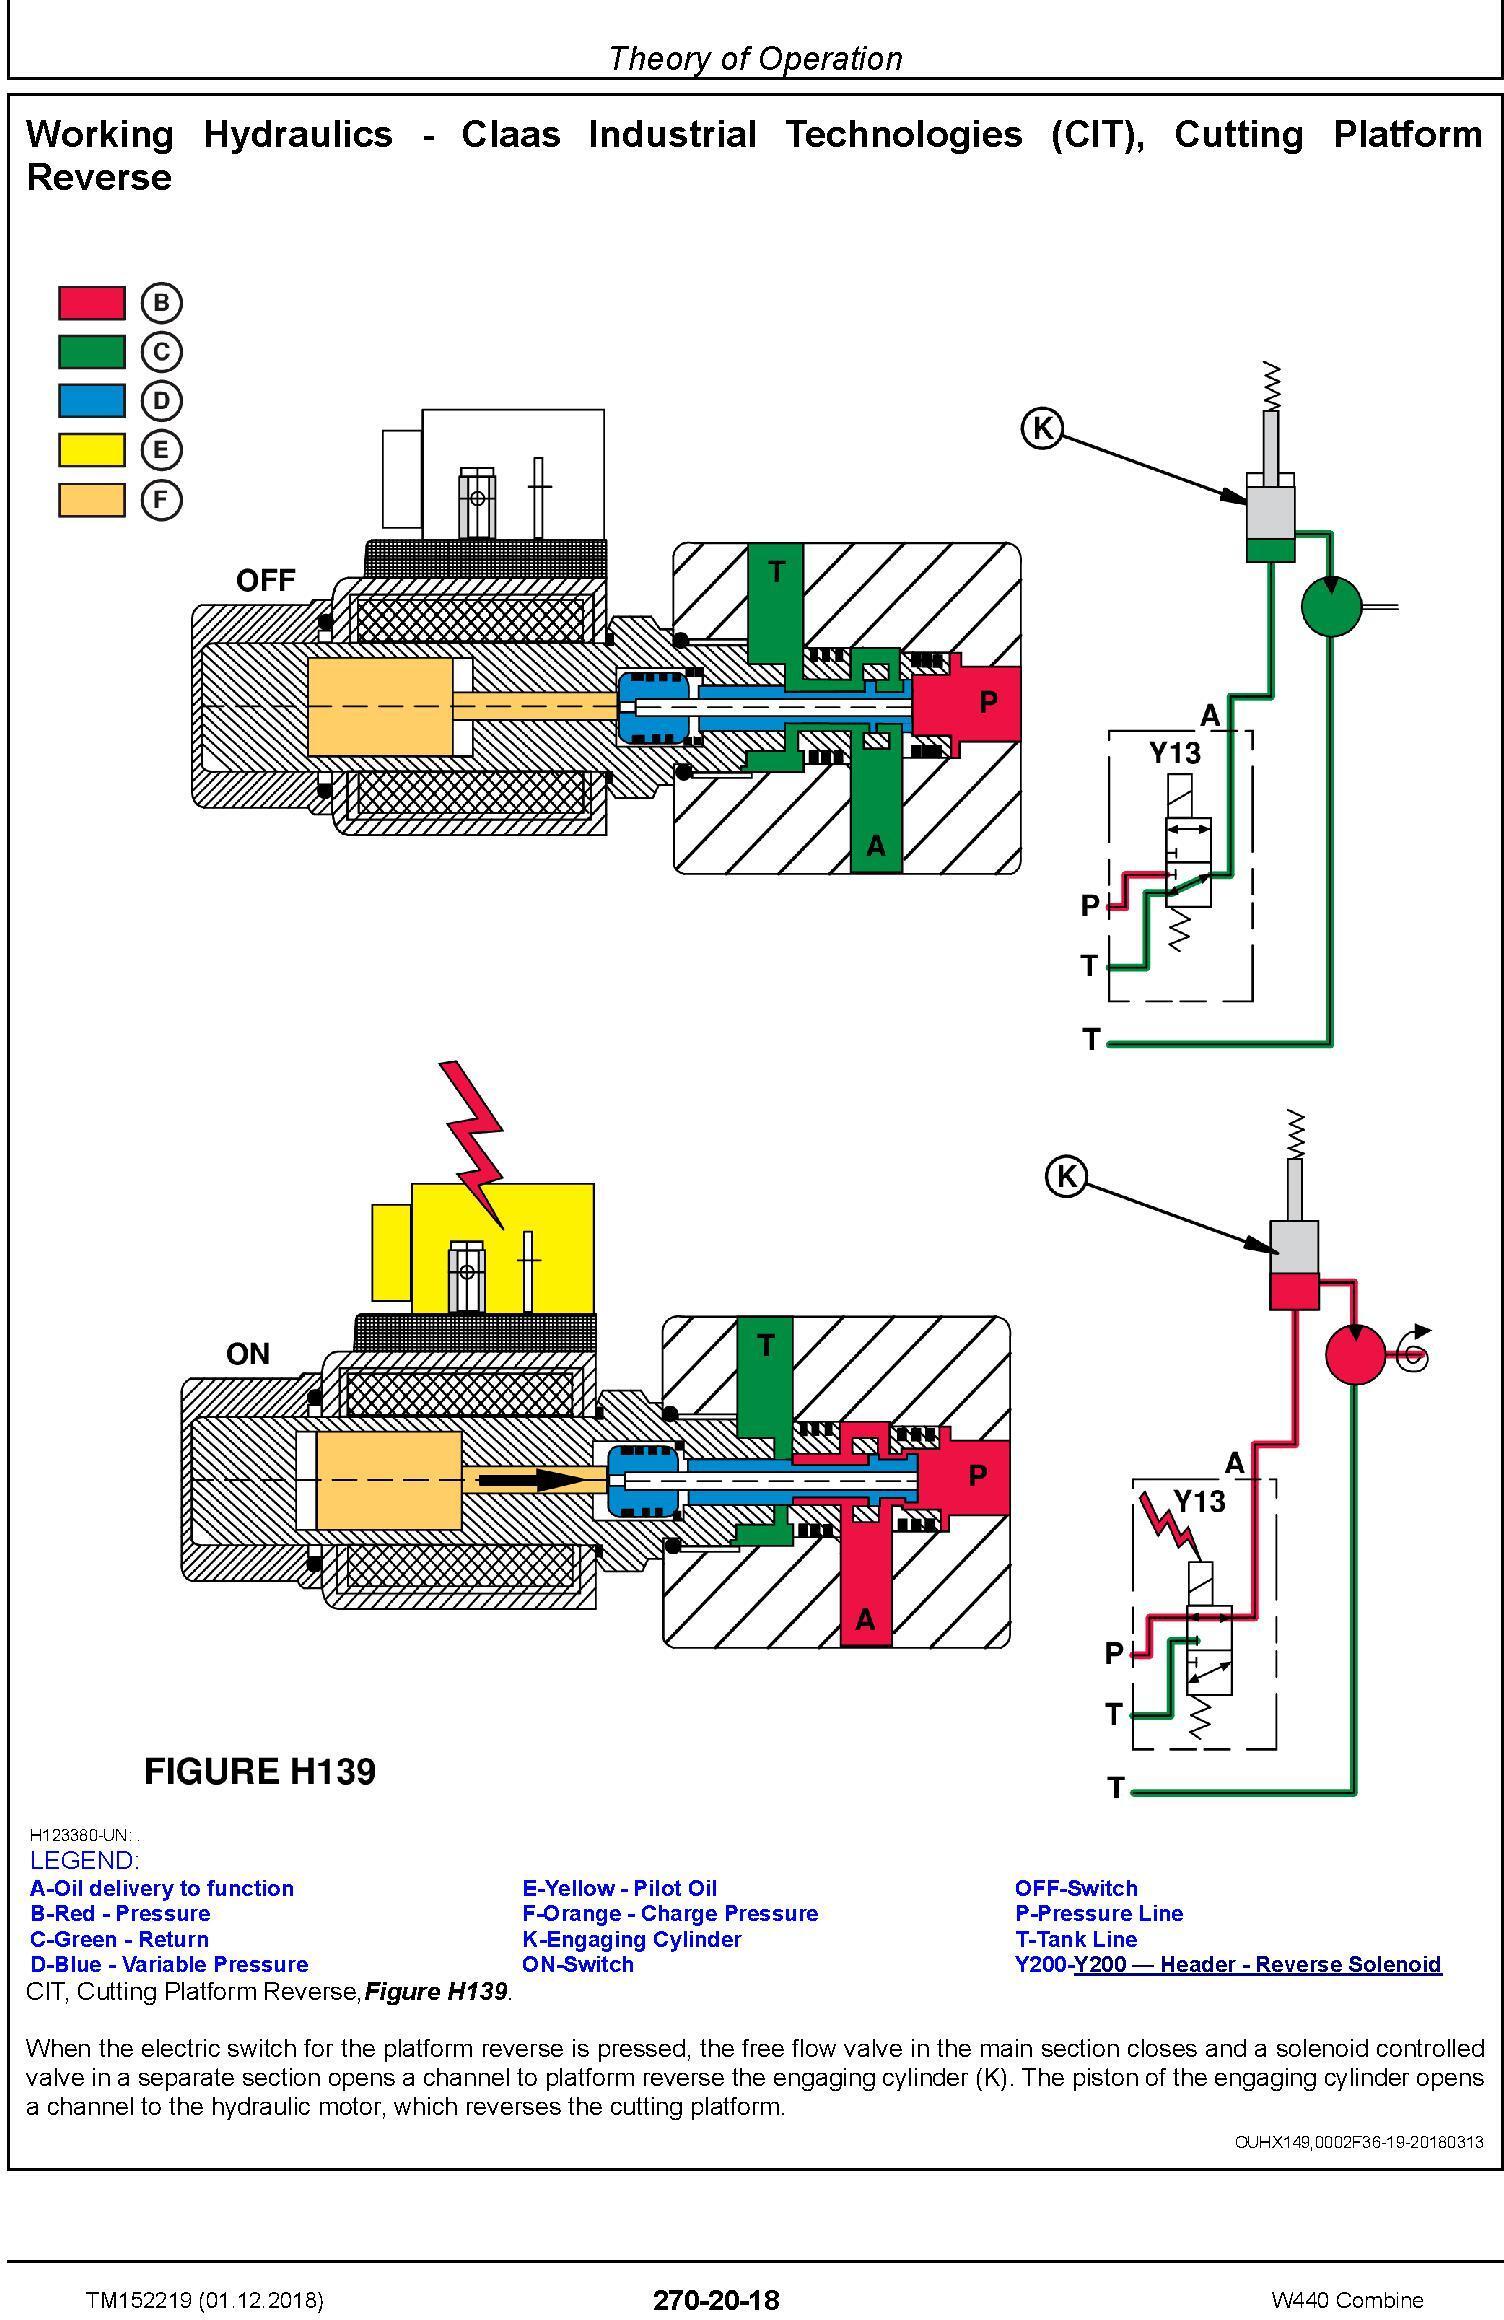 John Deere W440 Combine (SN.700949-) Diagnostic Technical Manual (TM152219) - 1